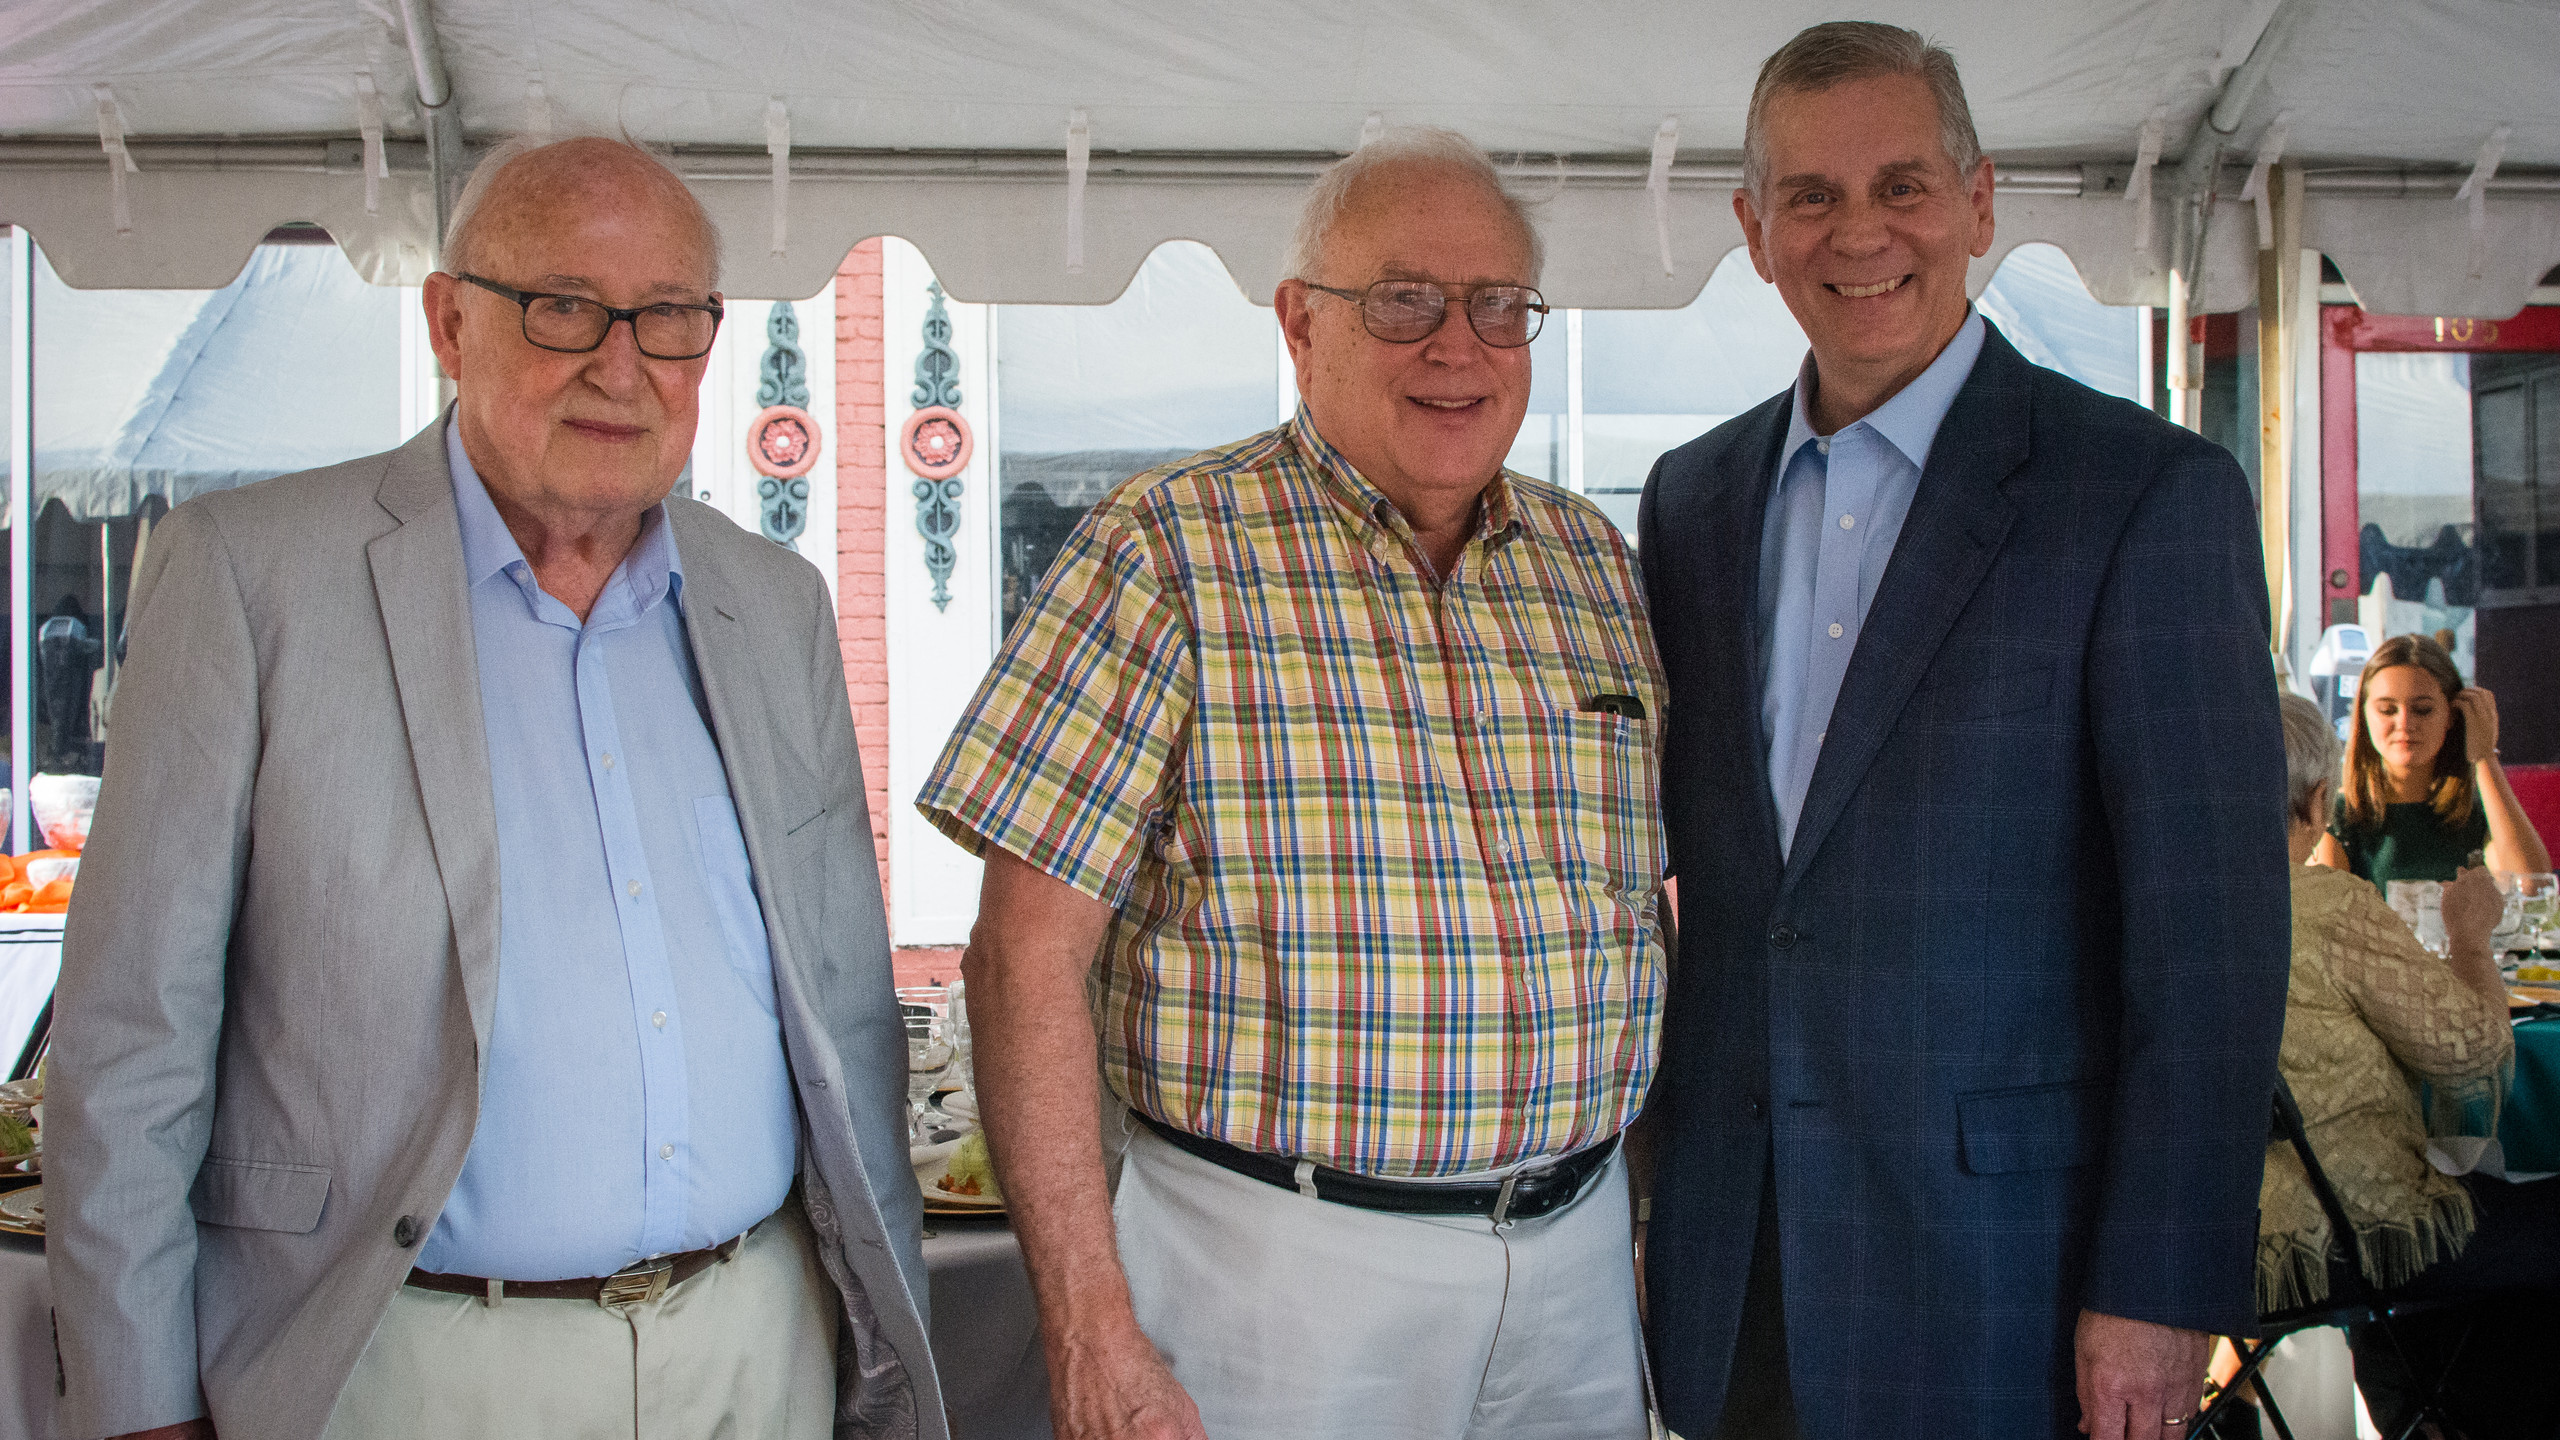 Ken Grambihler, Jim Mann, and Joe Pitts.